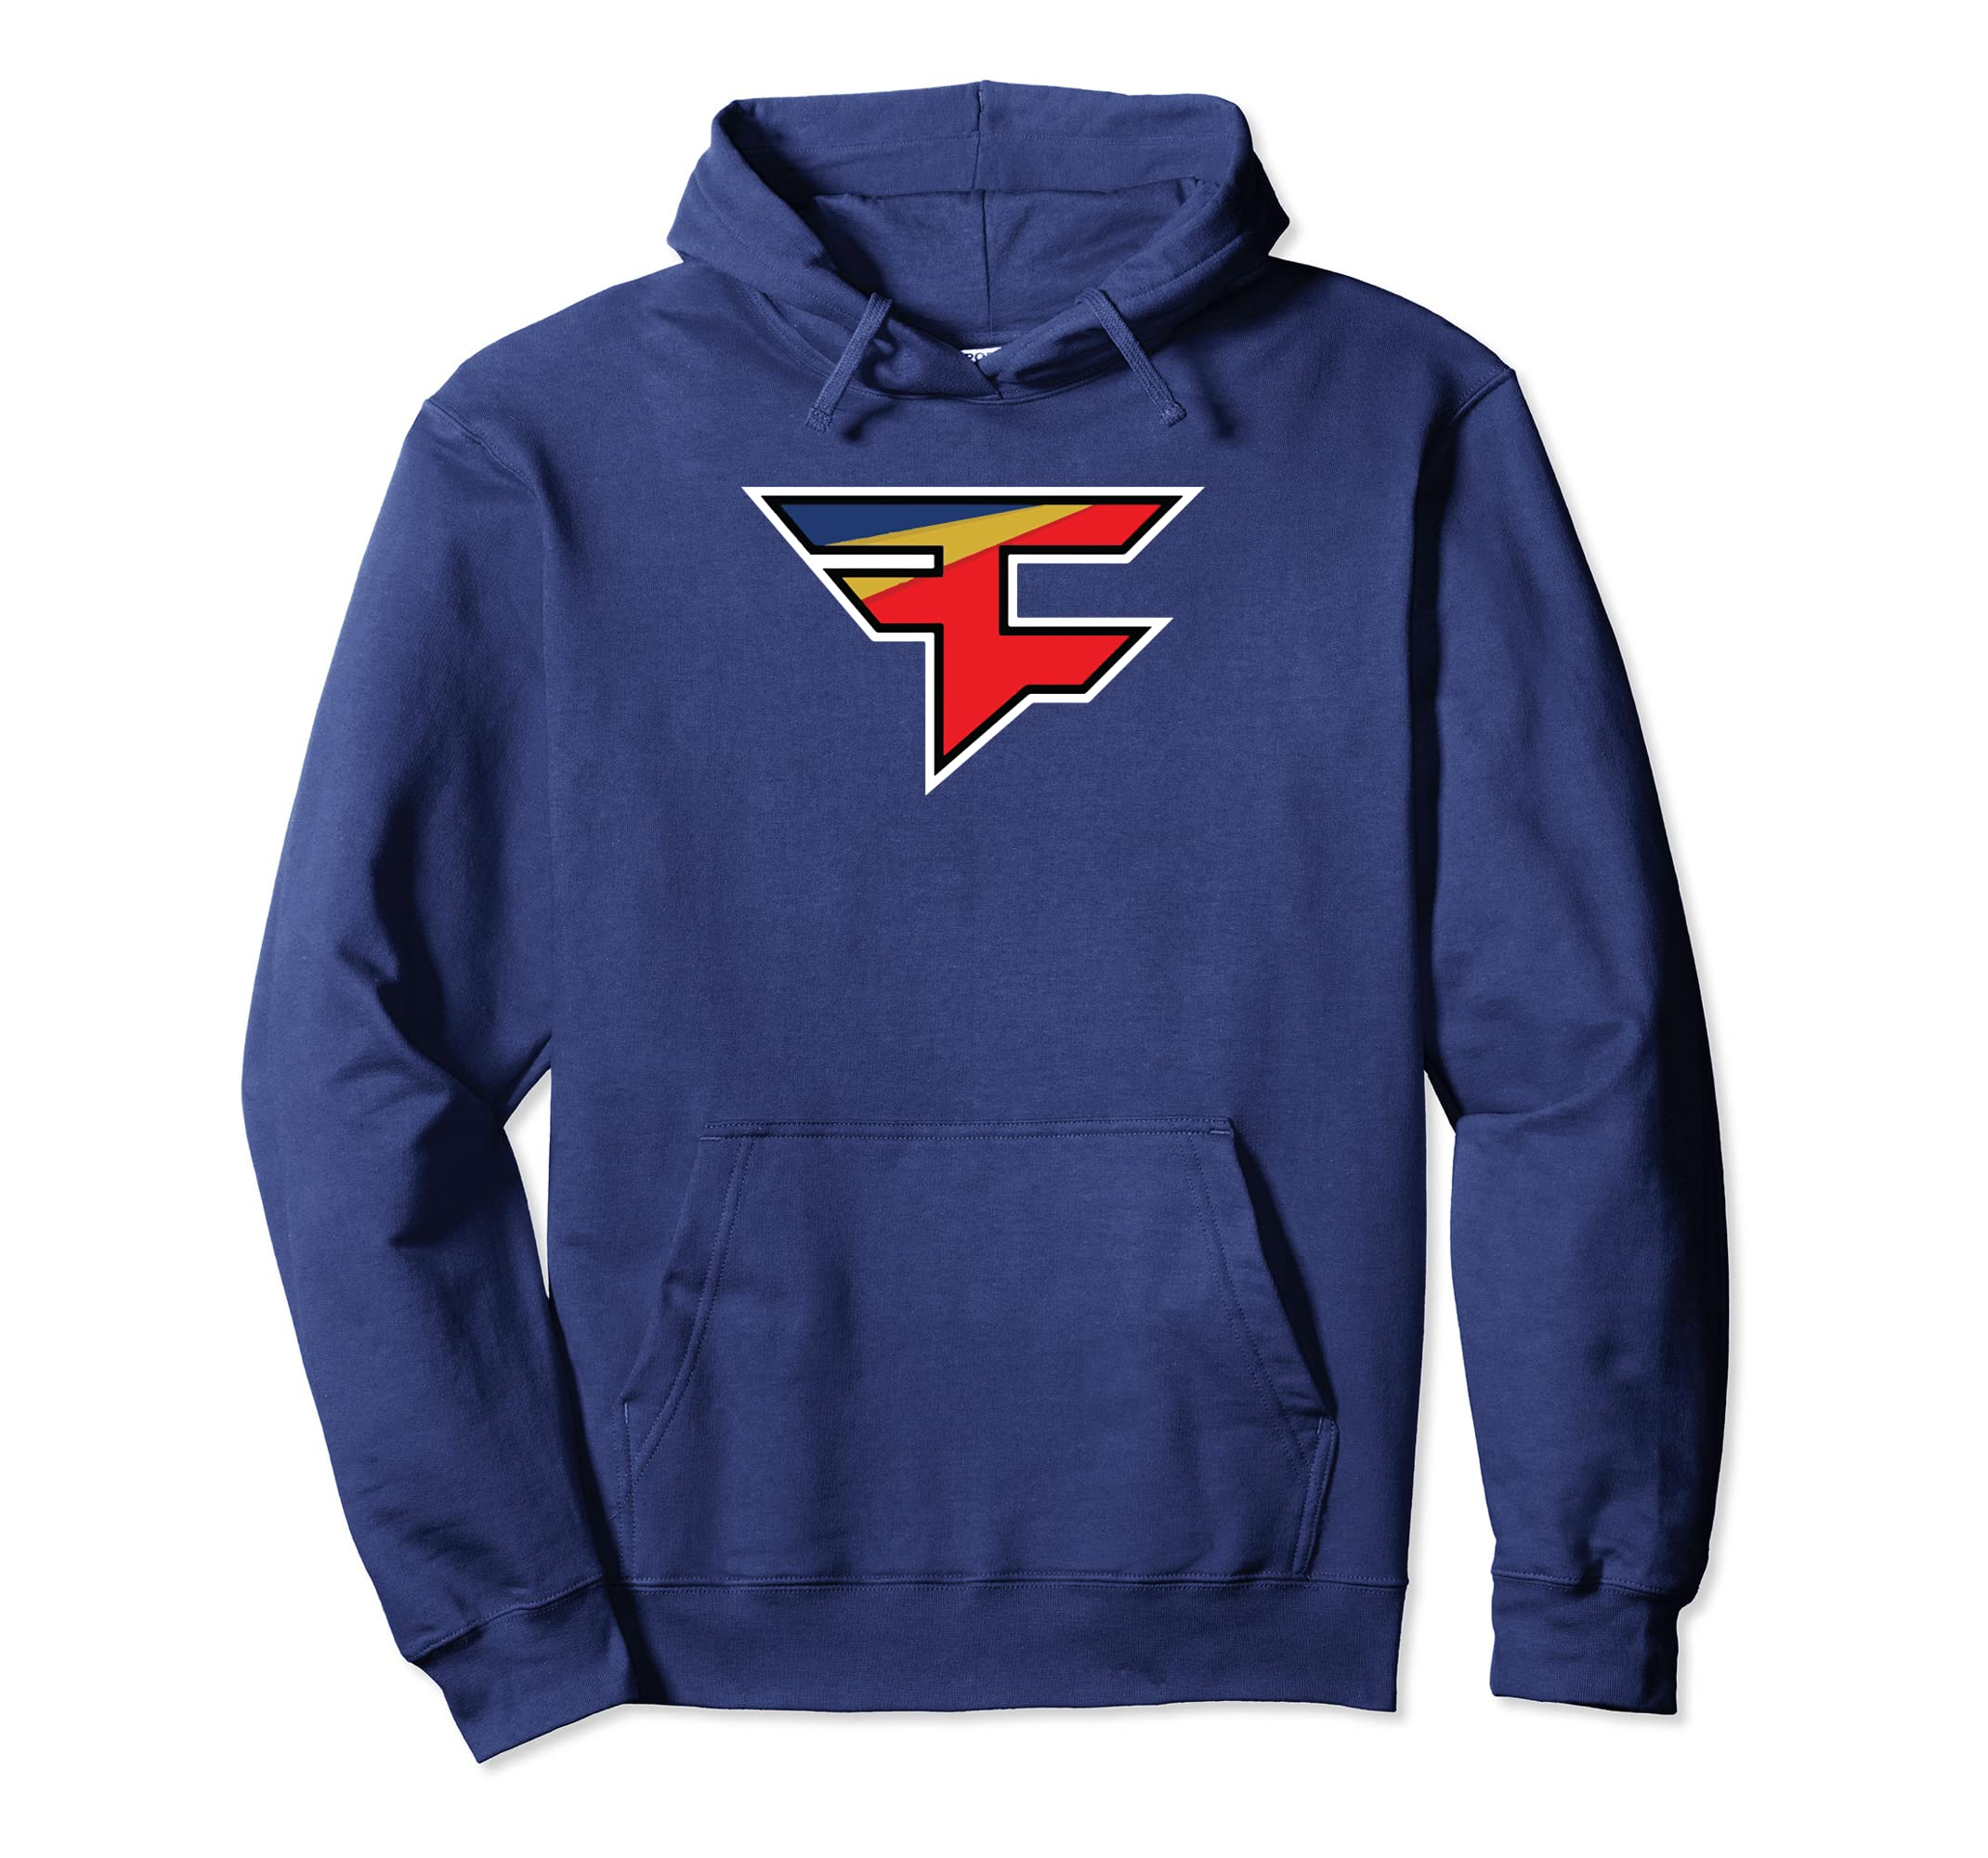 Amazon.com: tfue hoodie: Clothing